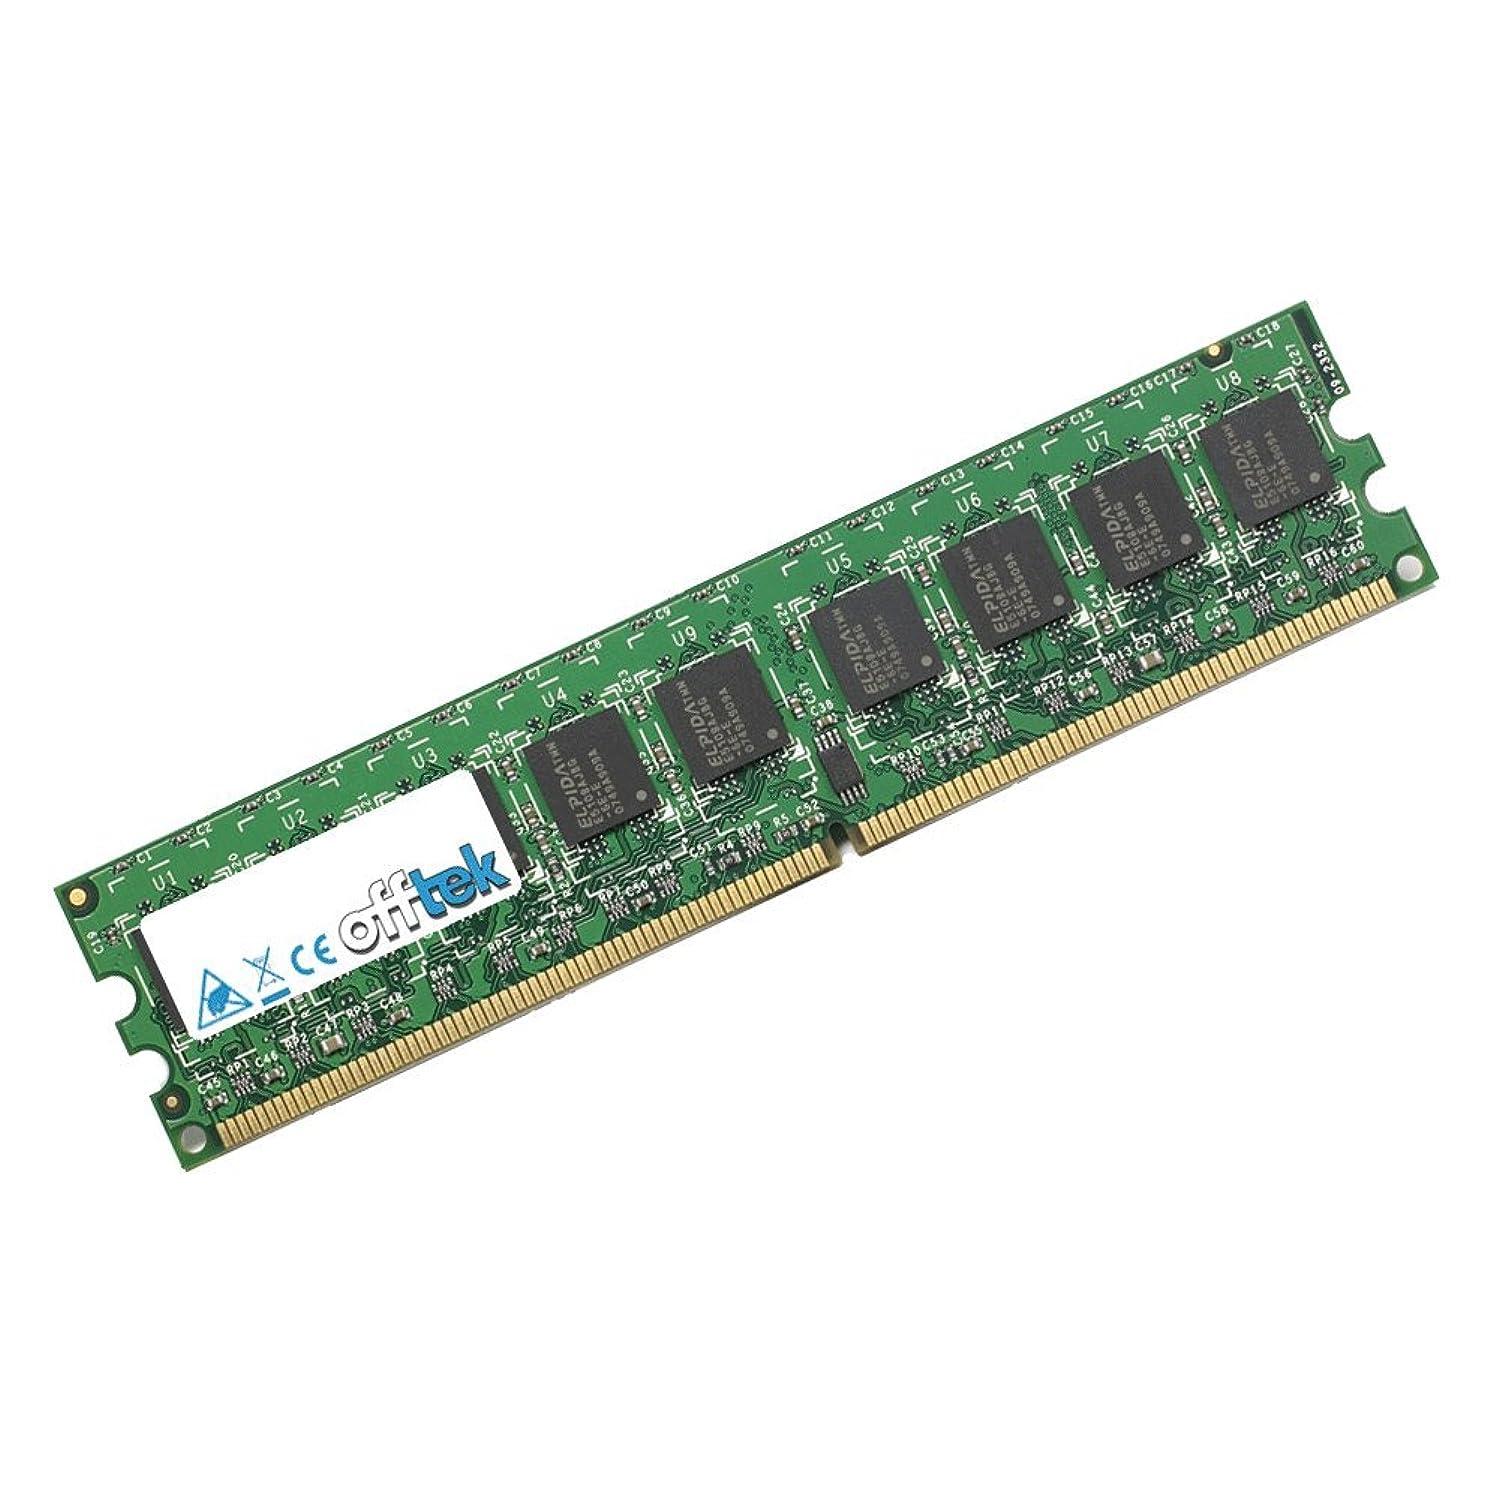 4GB RAM Memory for HP-Compaq Workstation z200 (SFF) (DDR3-10600 - ECC) - Workstation Memory Upgrade